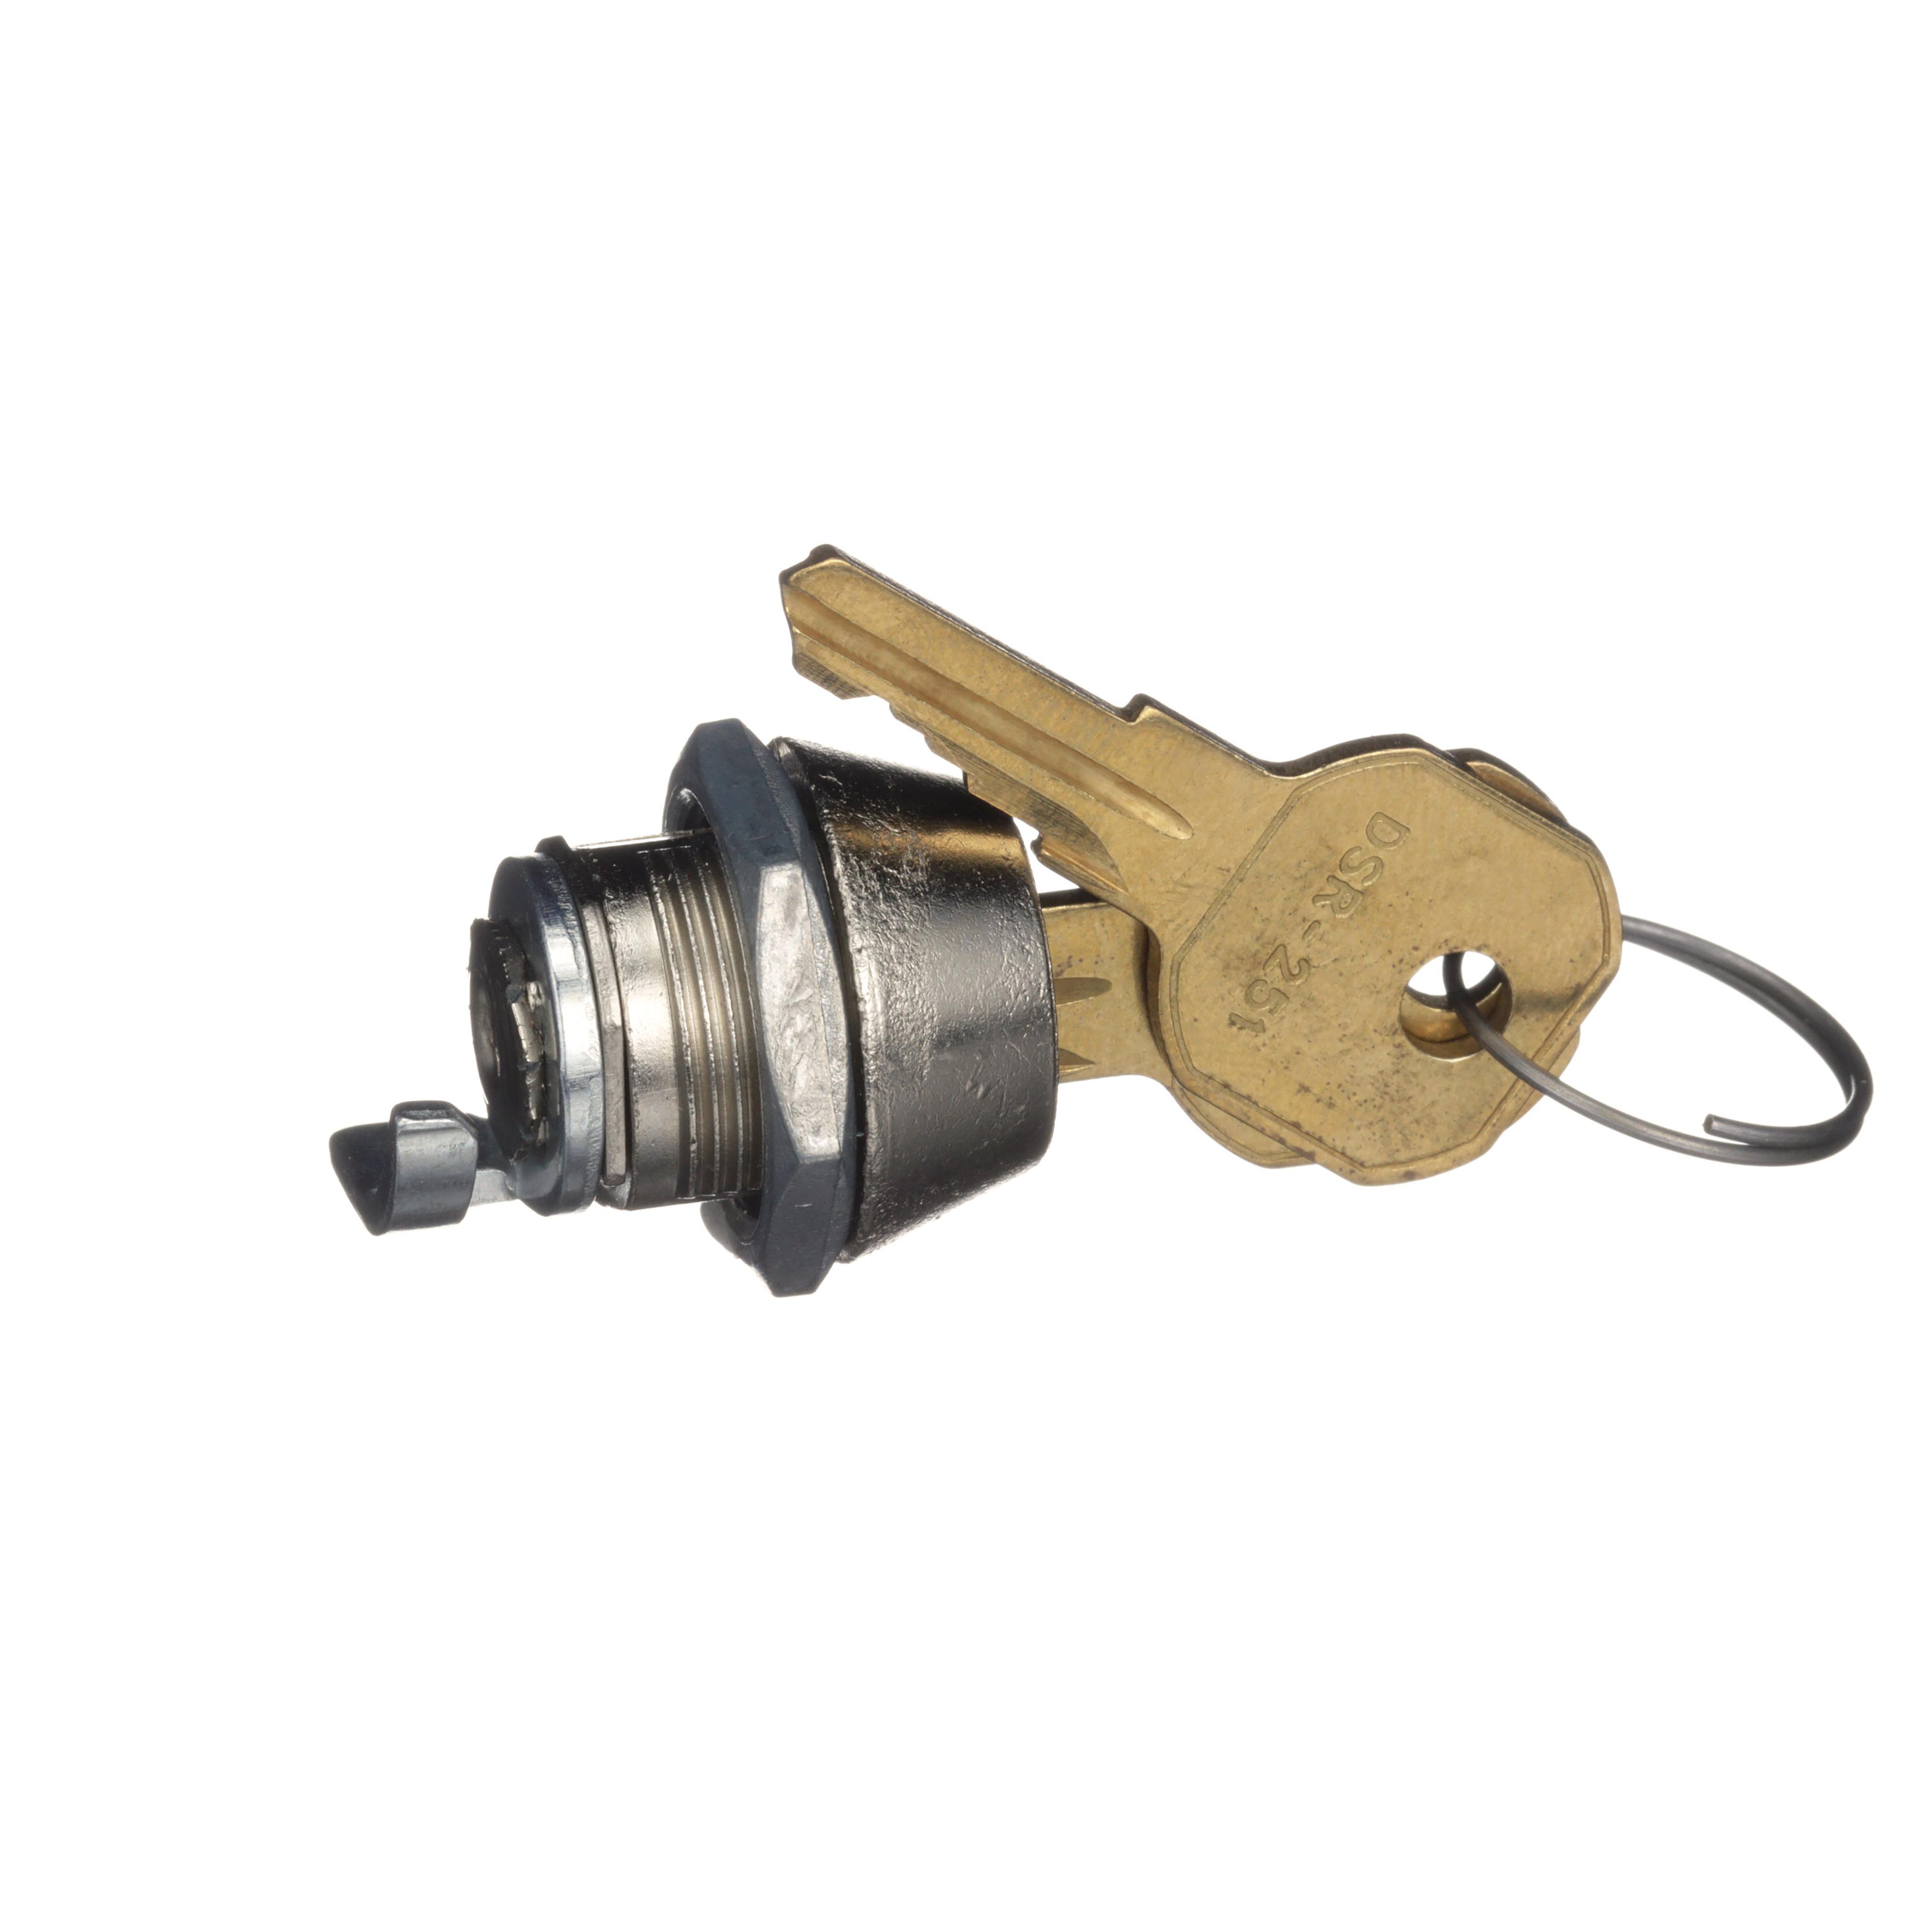 SQUARE D Panelboard Lock Kit